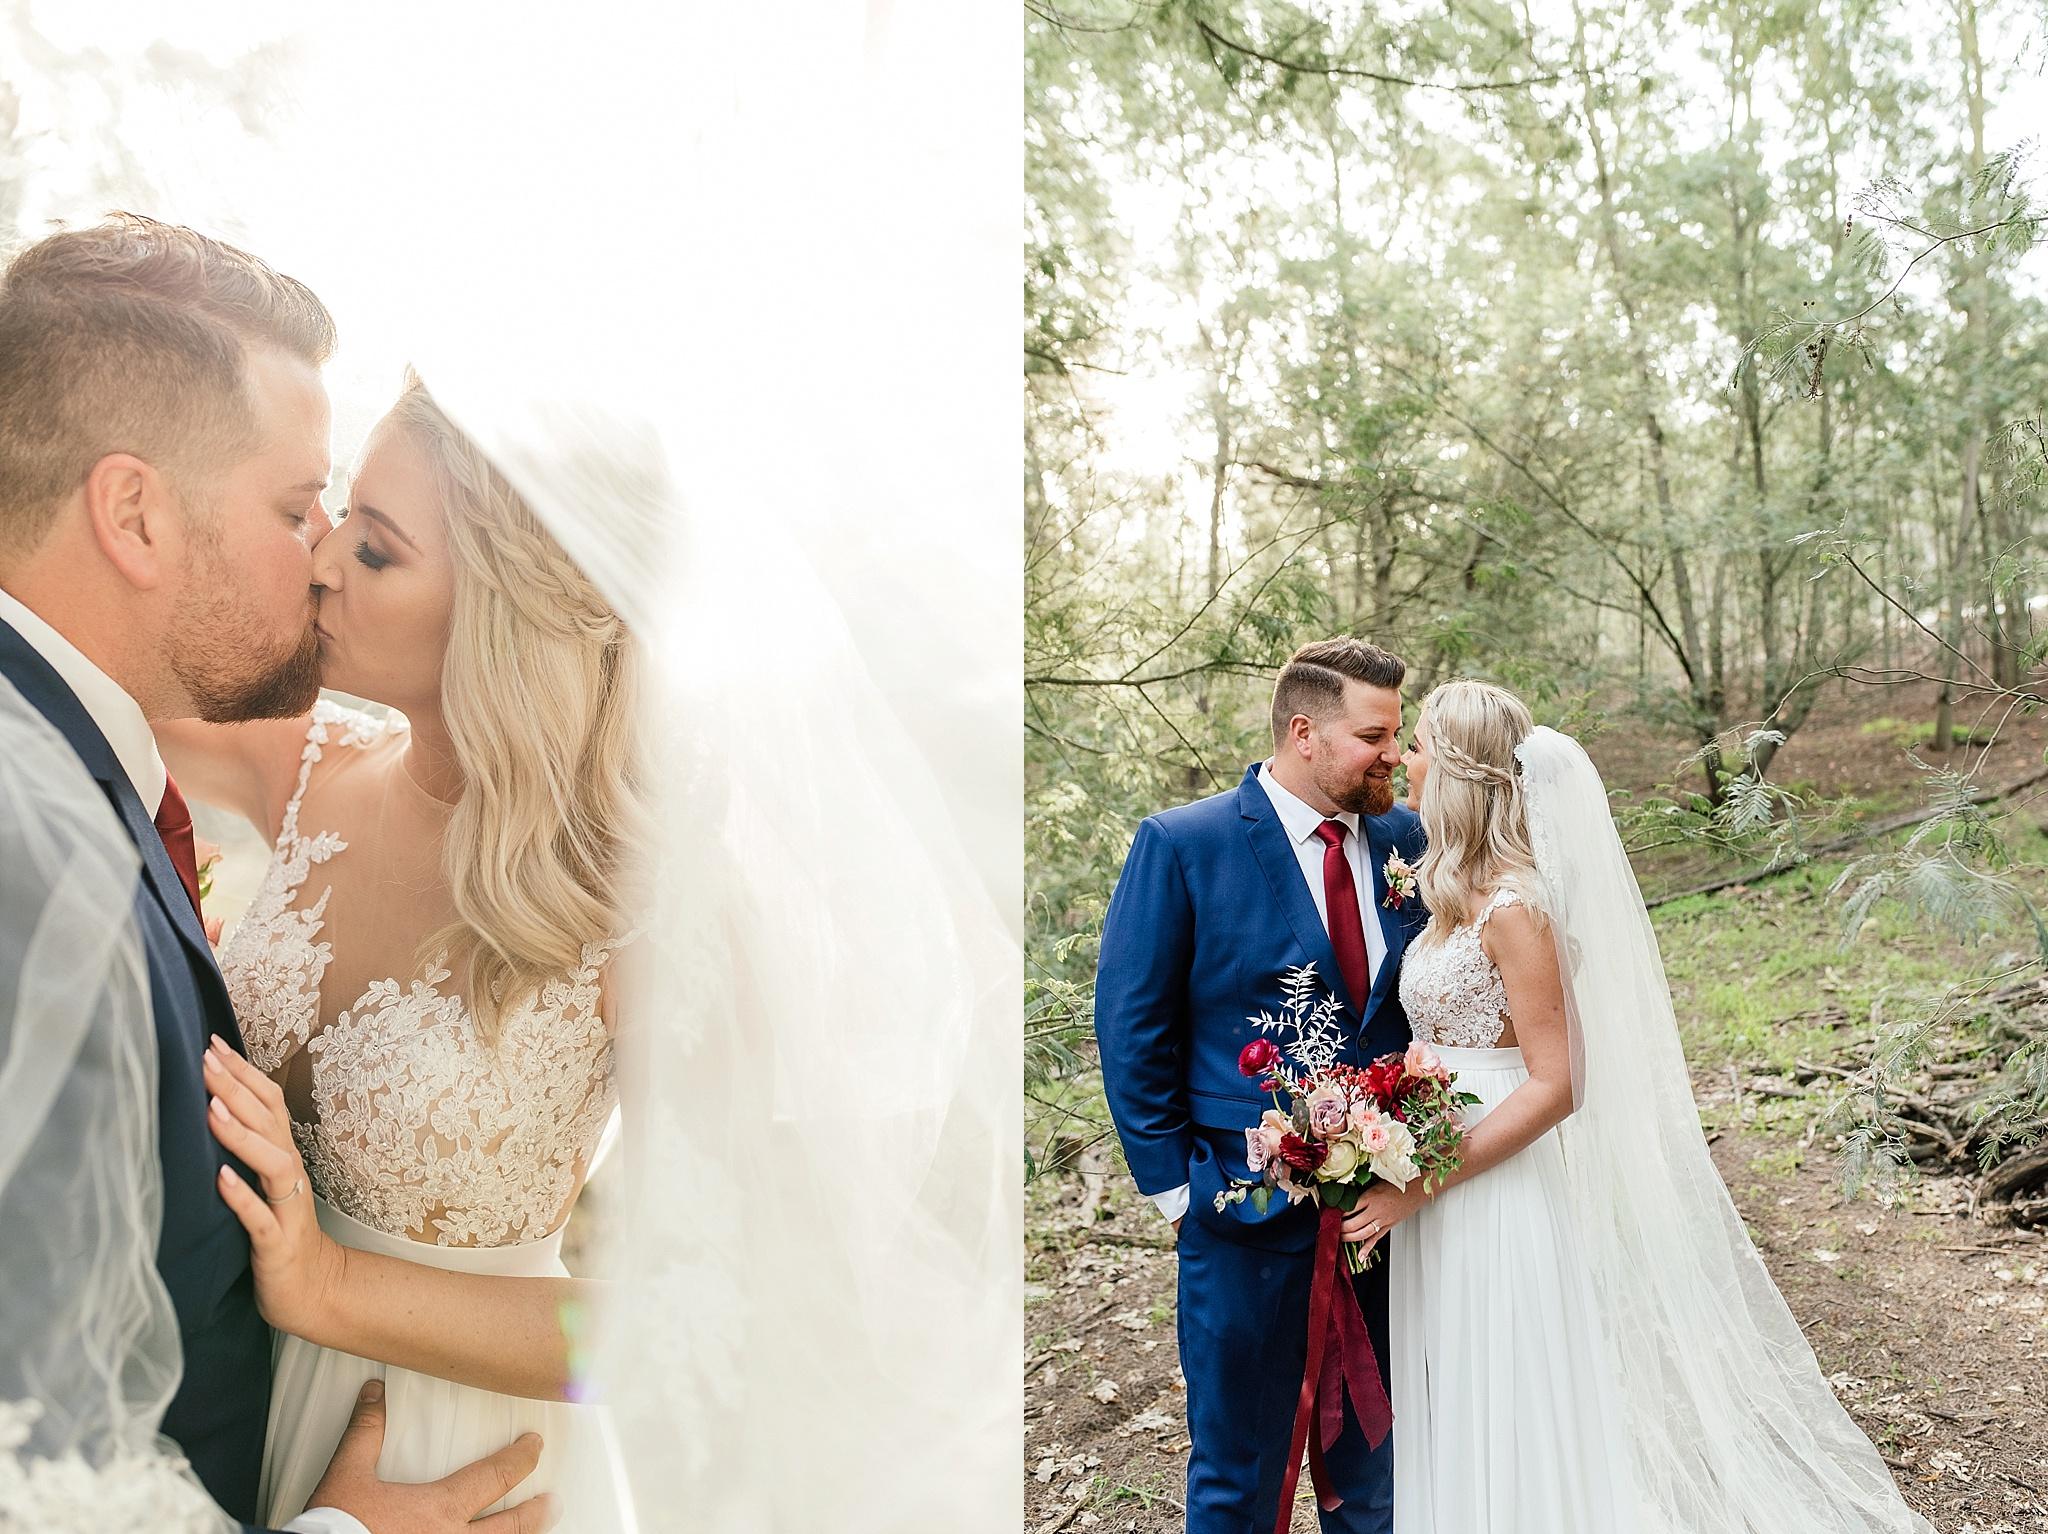 Cape Town Photographer Darren Bester - Die Woud Wedding - Gareth & Roxanne_0027.jpg